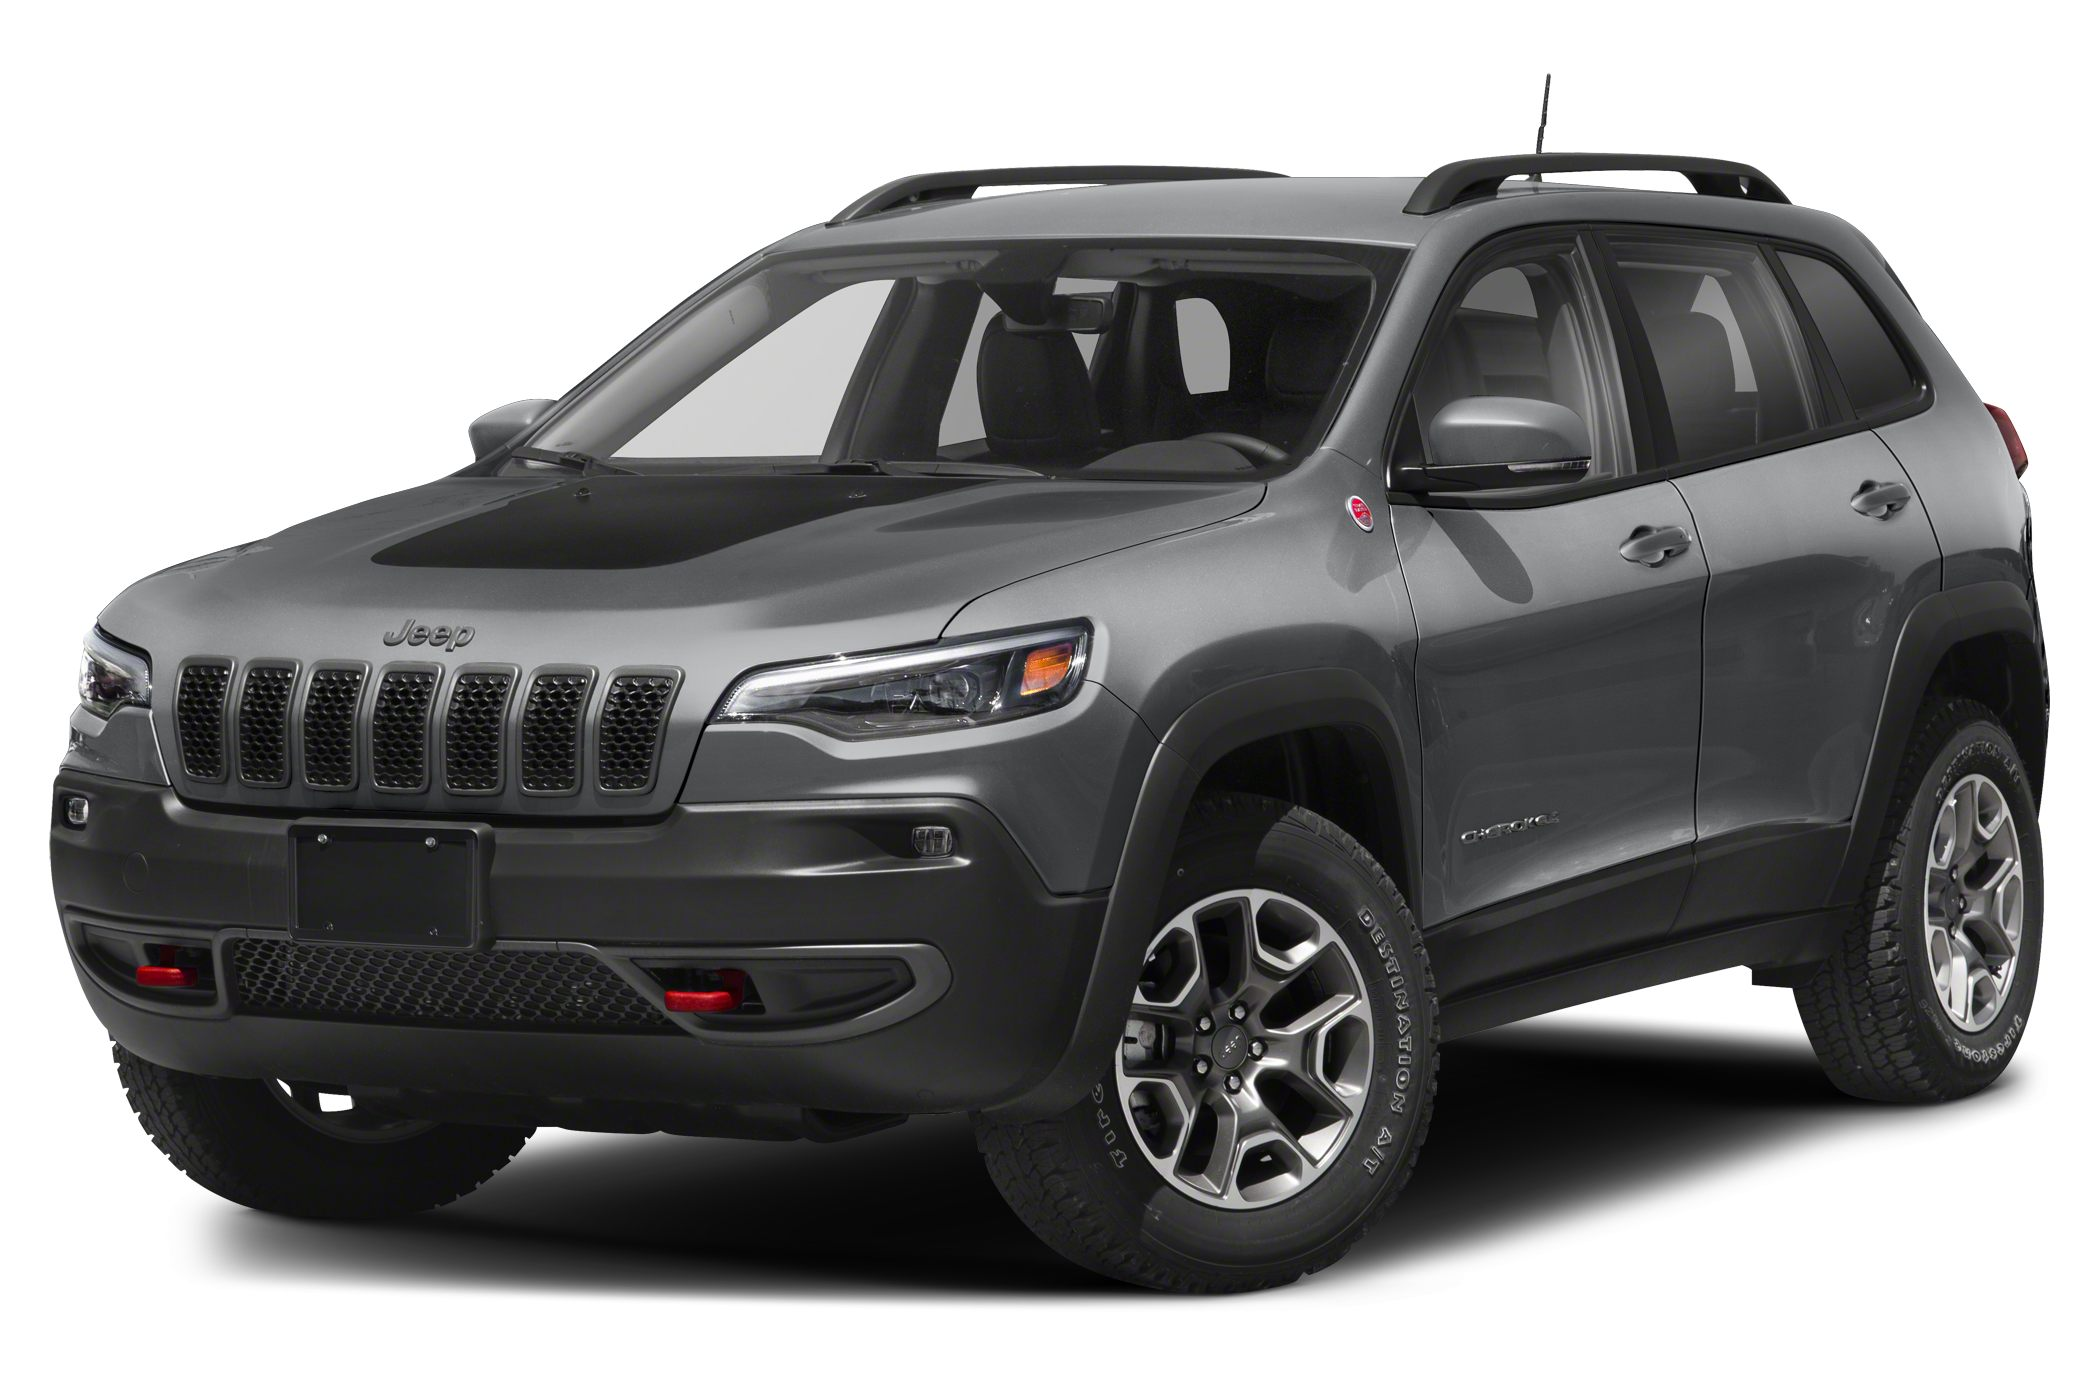 2020 Jeep Cherokee Trailhawk 4dr 4x4